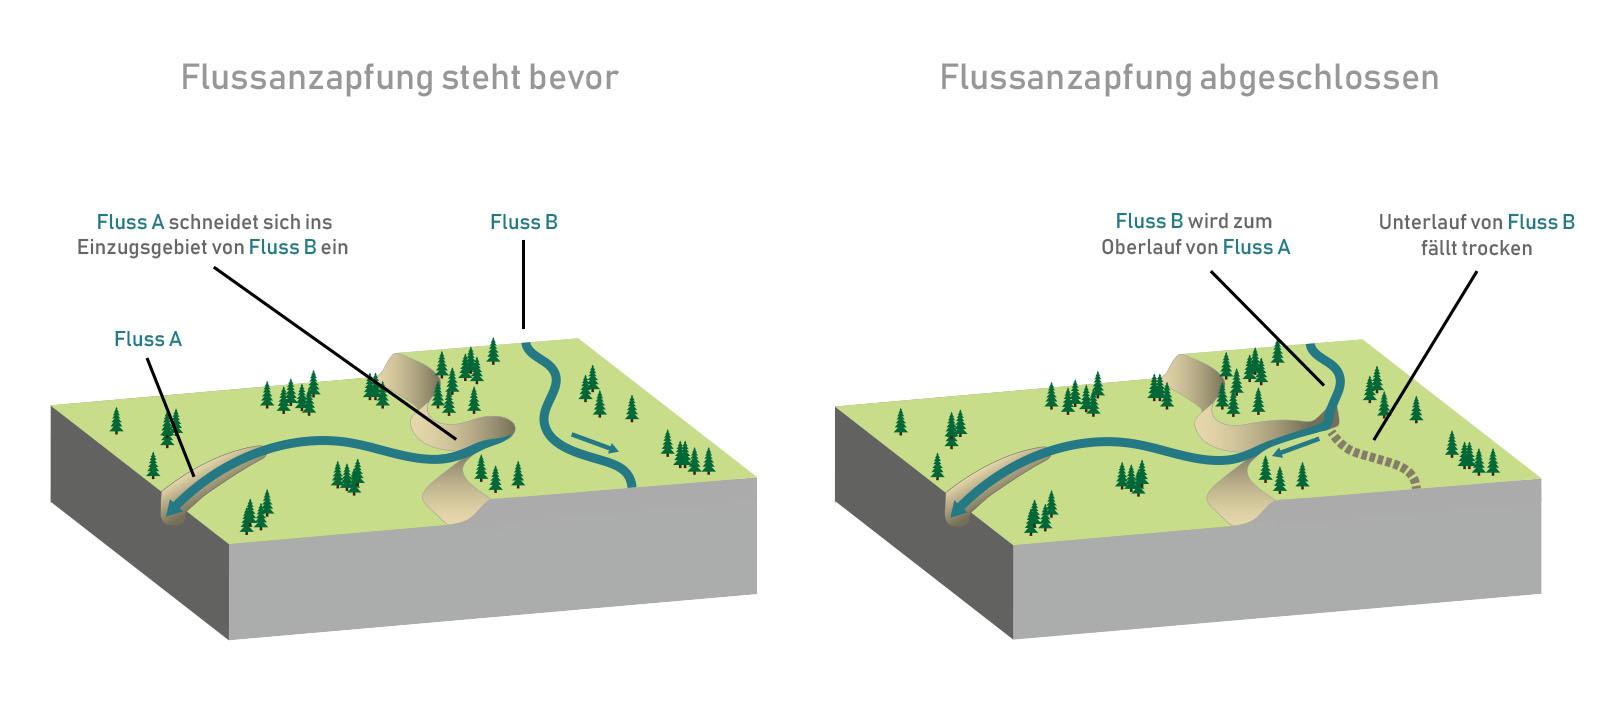 flussanzapfung_fluss-kanibalisierung